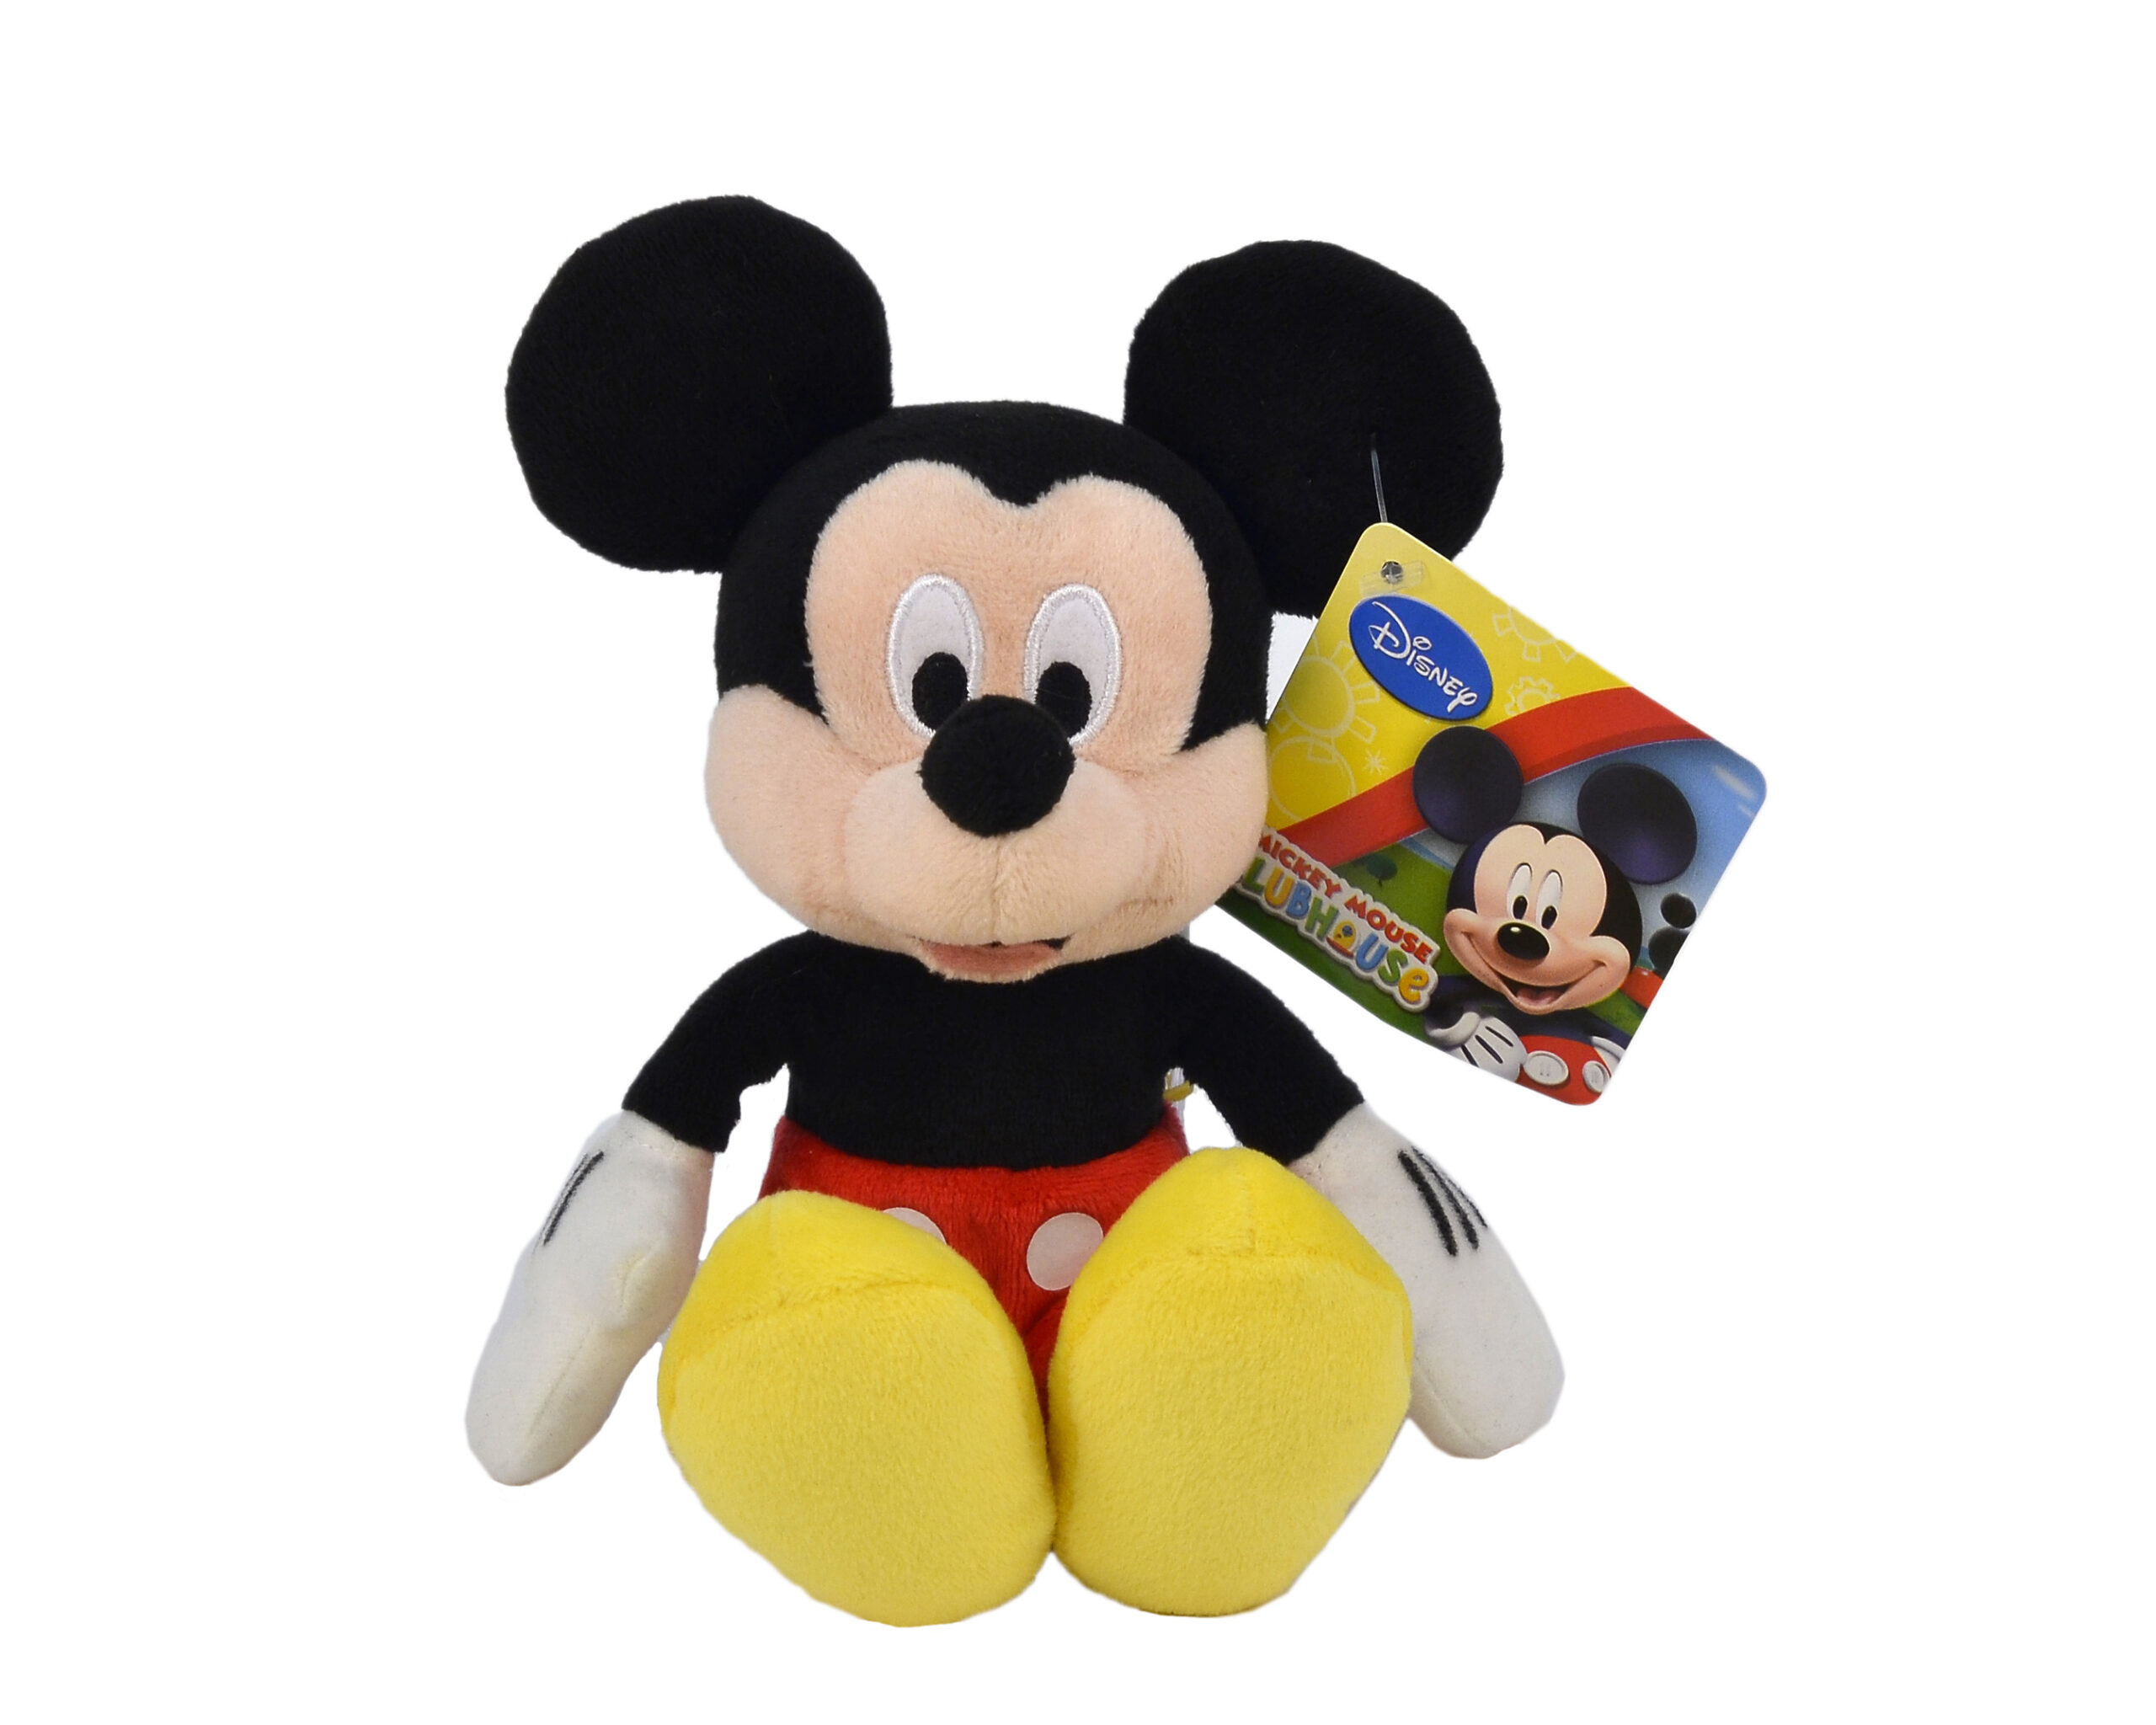 "Disney Plush - Mickey & Friends - Mickey Standard 8"" (PDP1100447)"